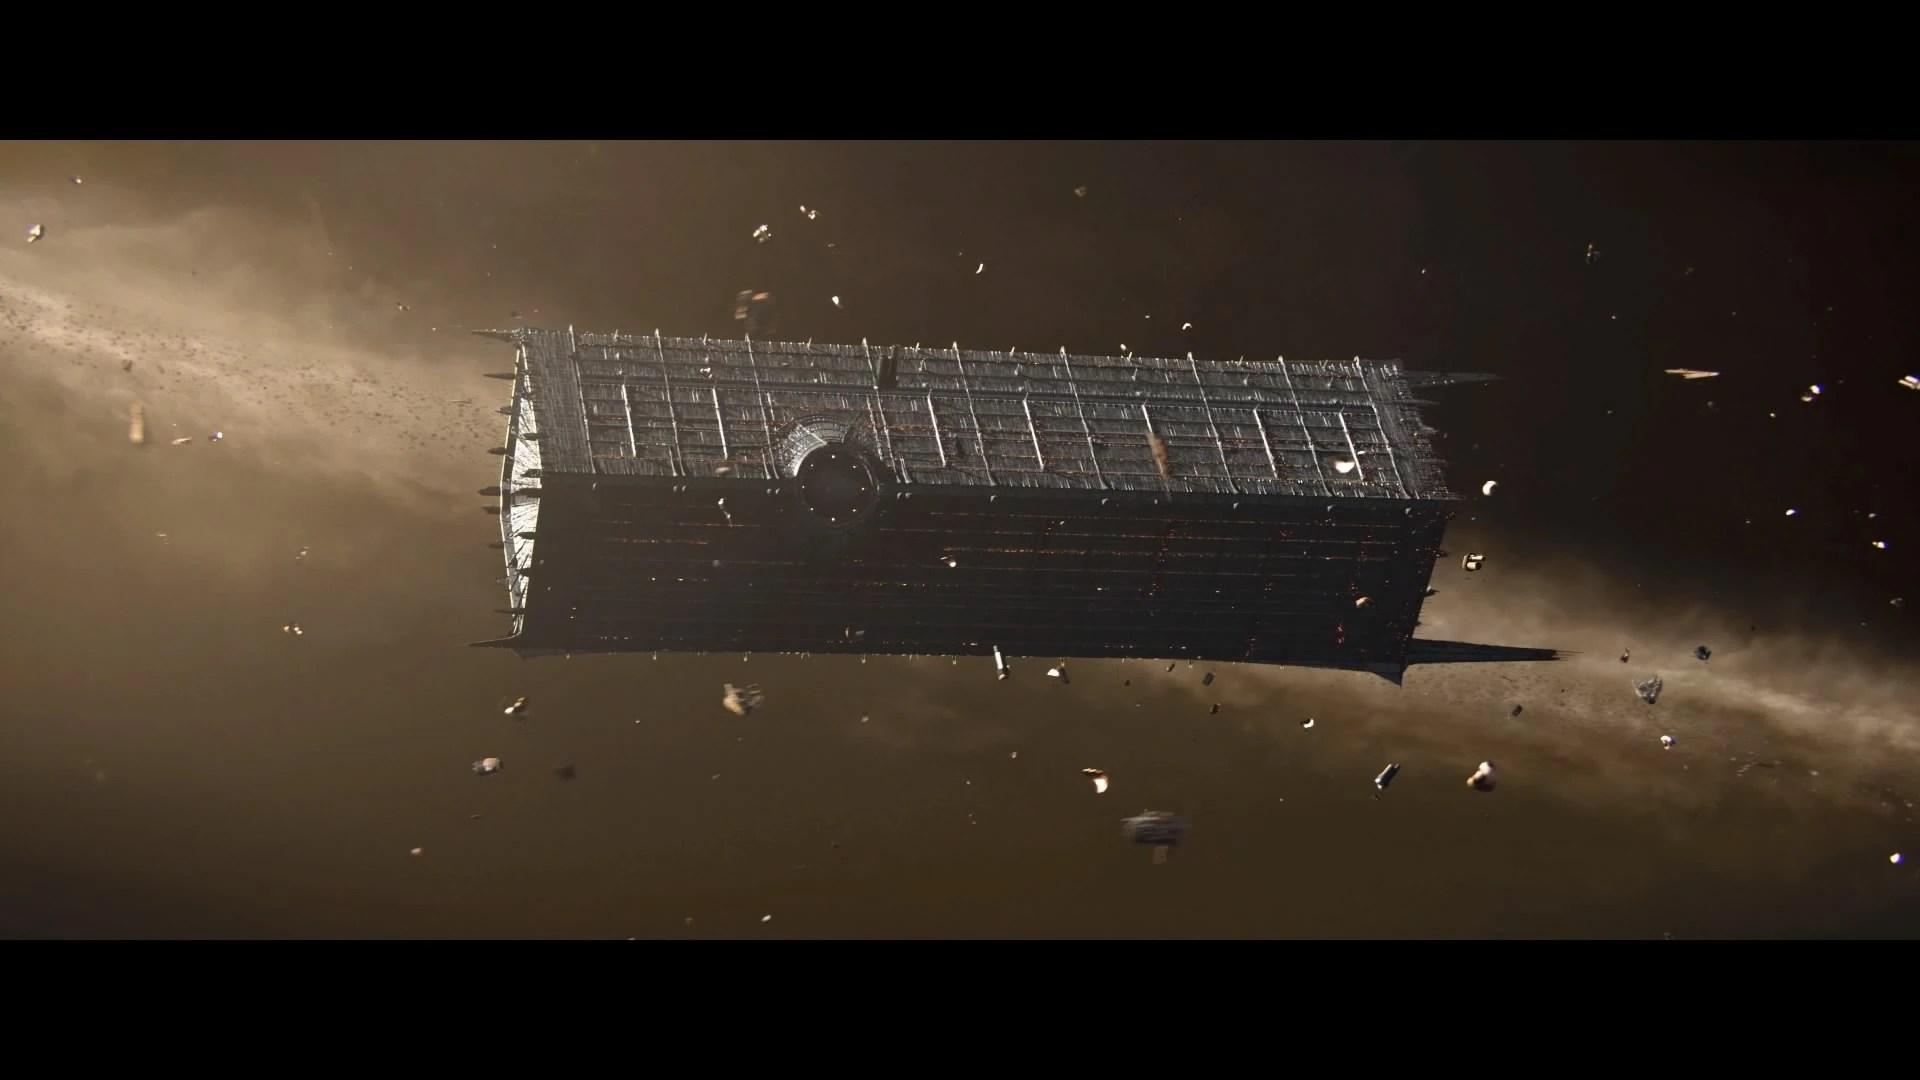 Destiny 2 Kings Fall Wallpaper Dreadnaught Destiny Wiki Fandom Powered By Wikia